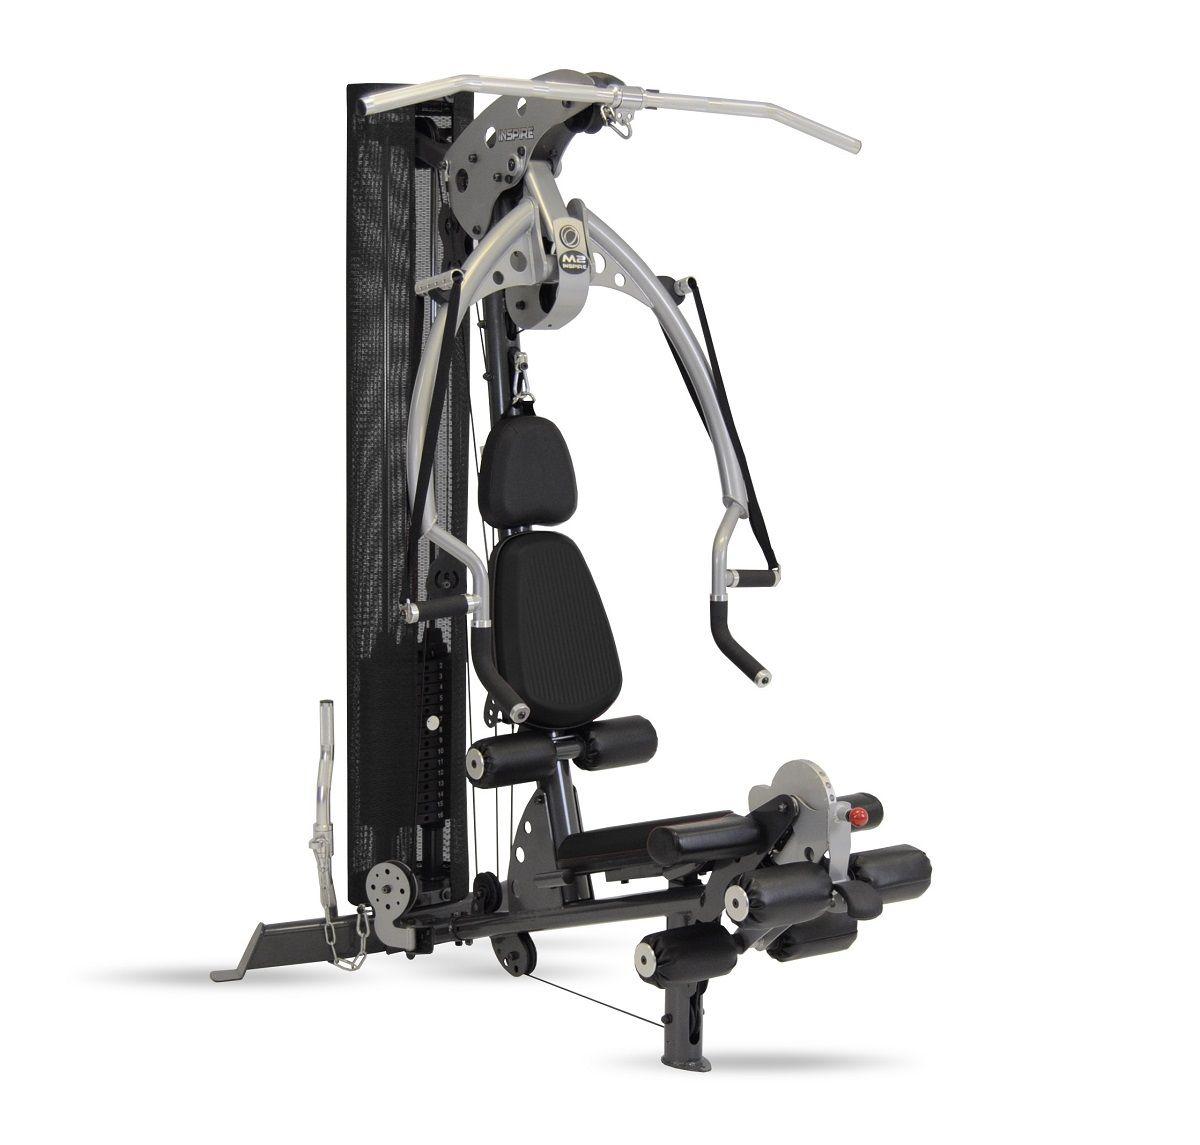 Home Gym (1 coluna 75 kg) - Semi-Profissional